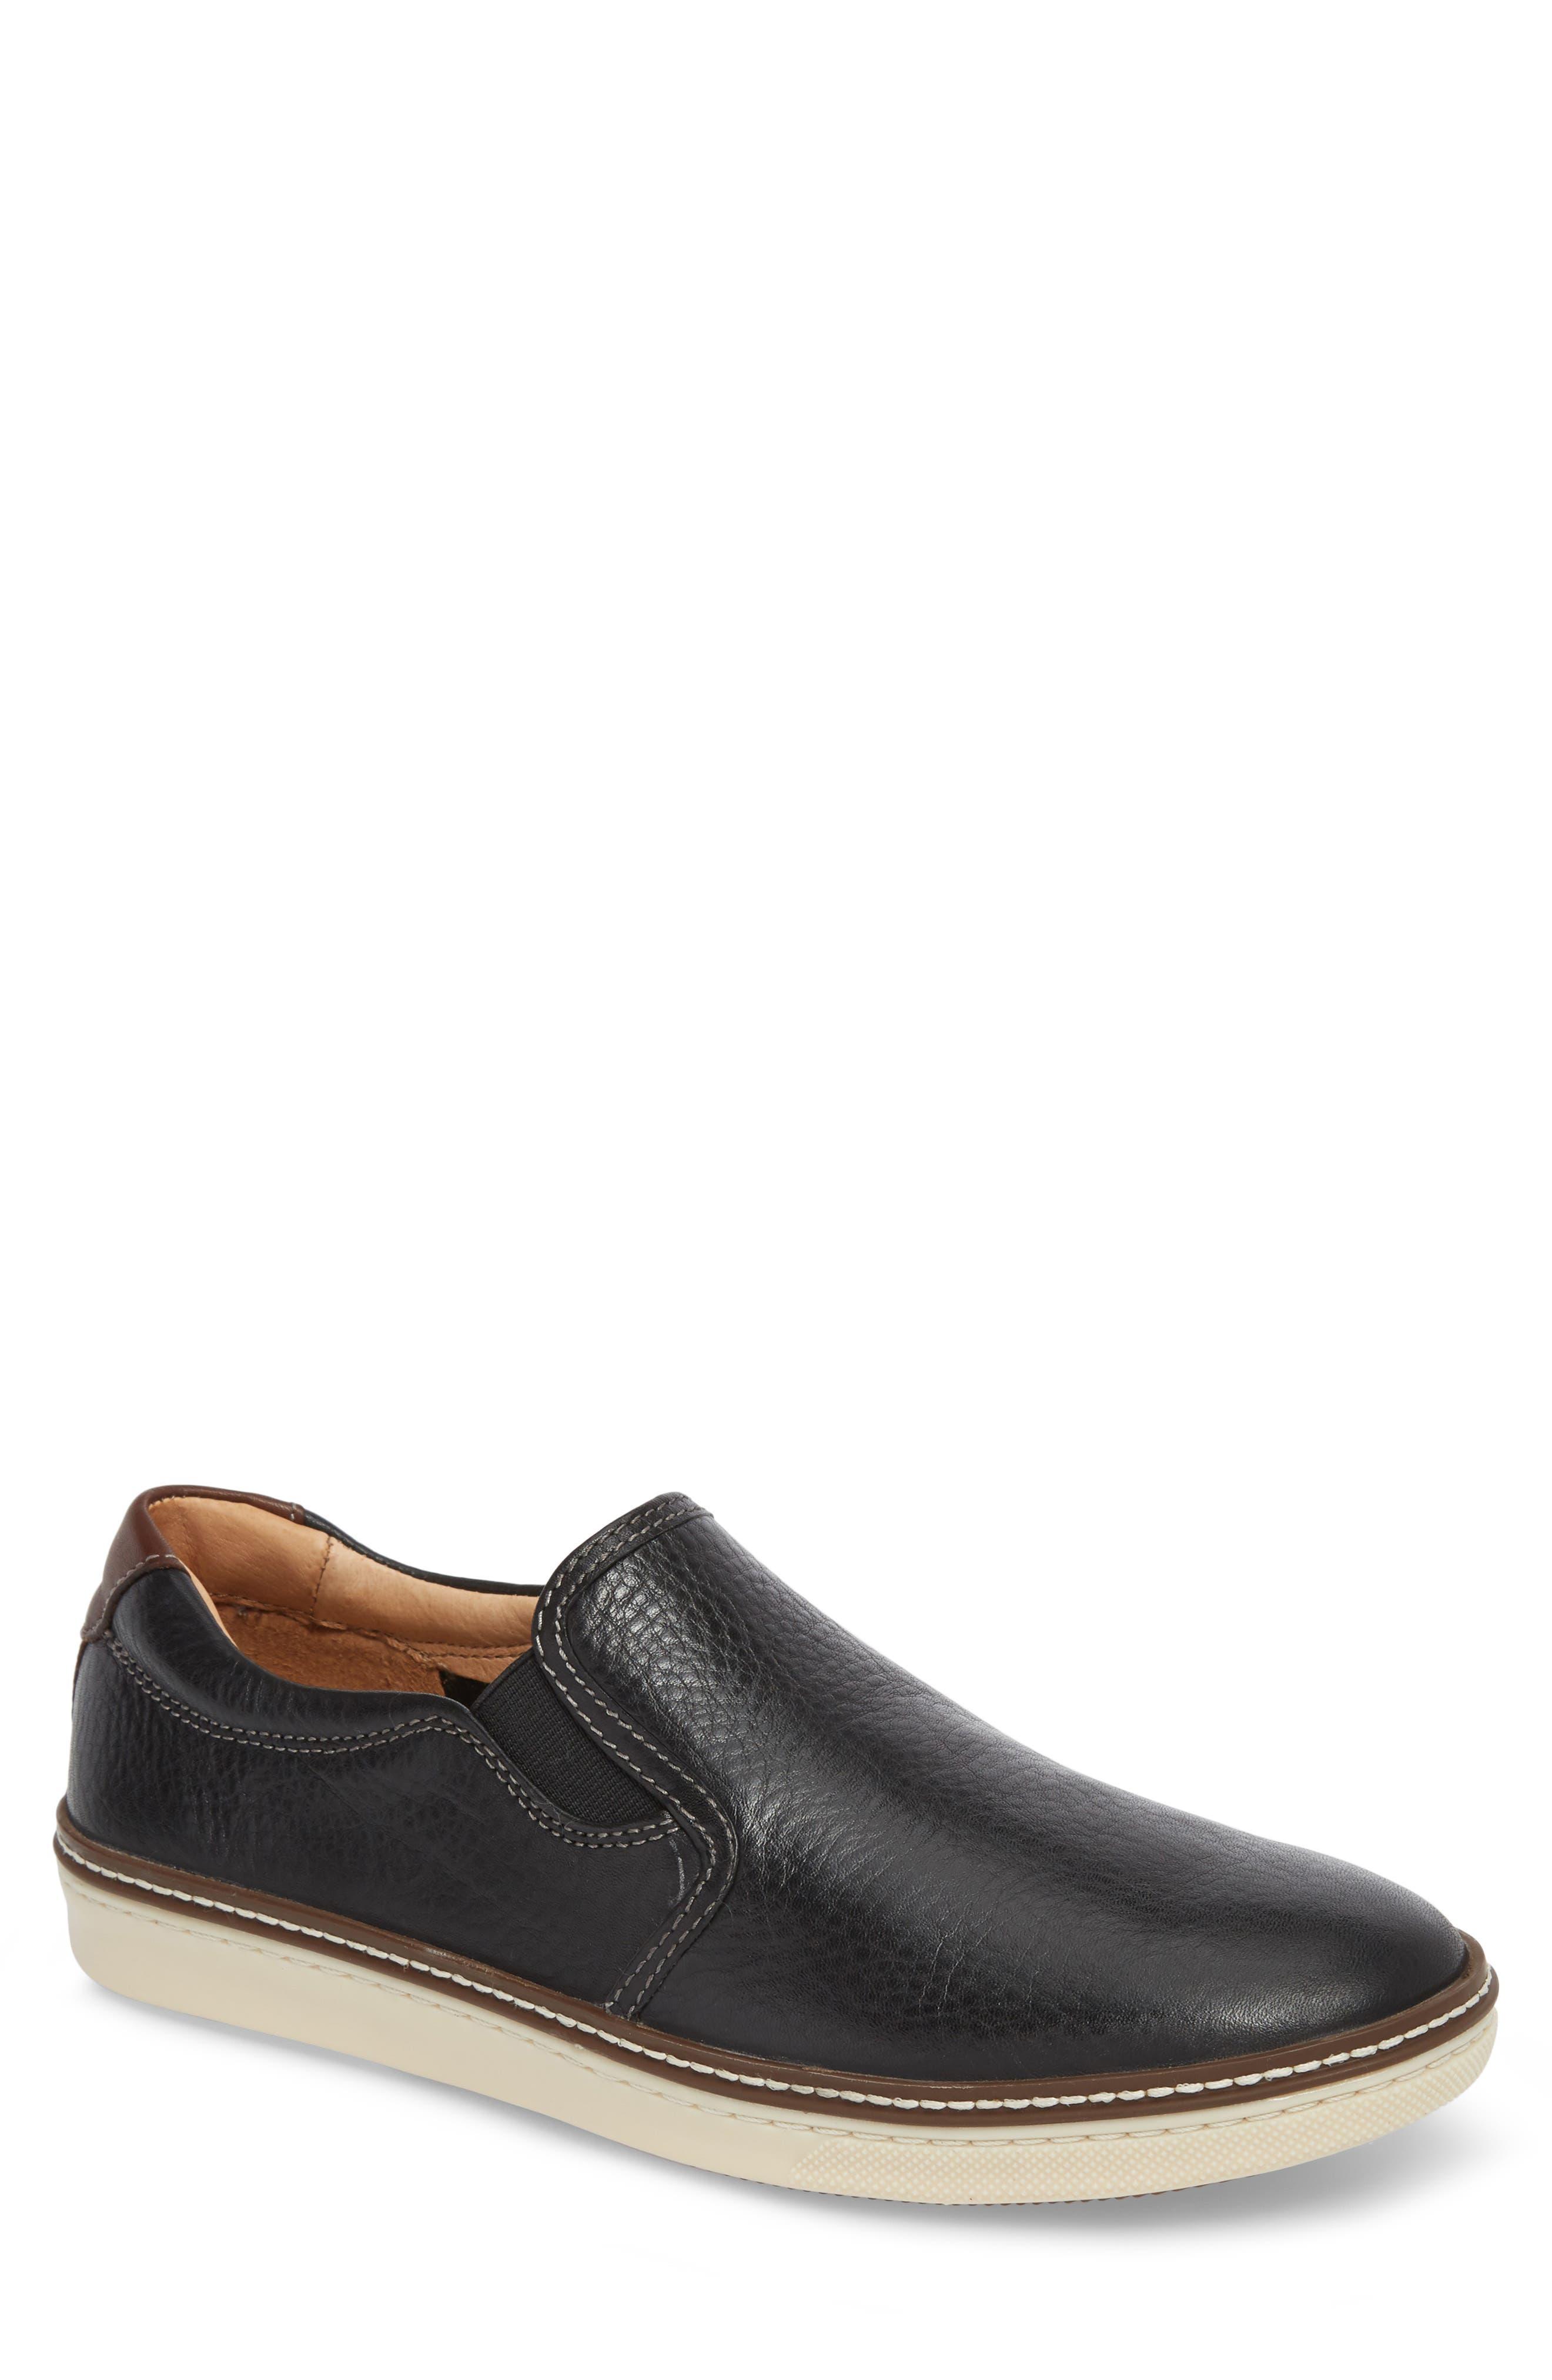 JOHNSTON & MURPHY, McGuffey Slip-On Sneaker, Main thumbnail 1, color, BLACK LEATHER